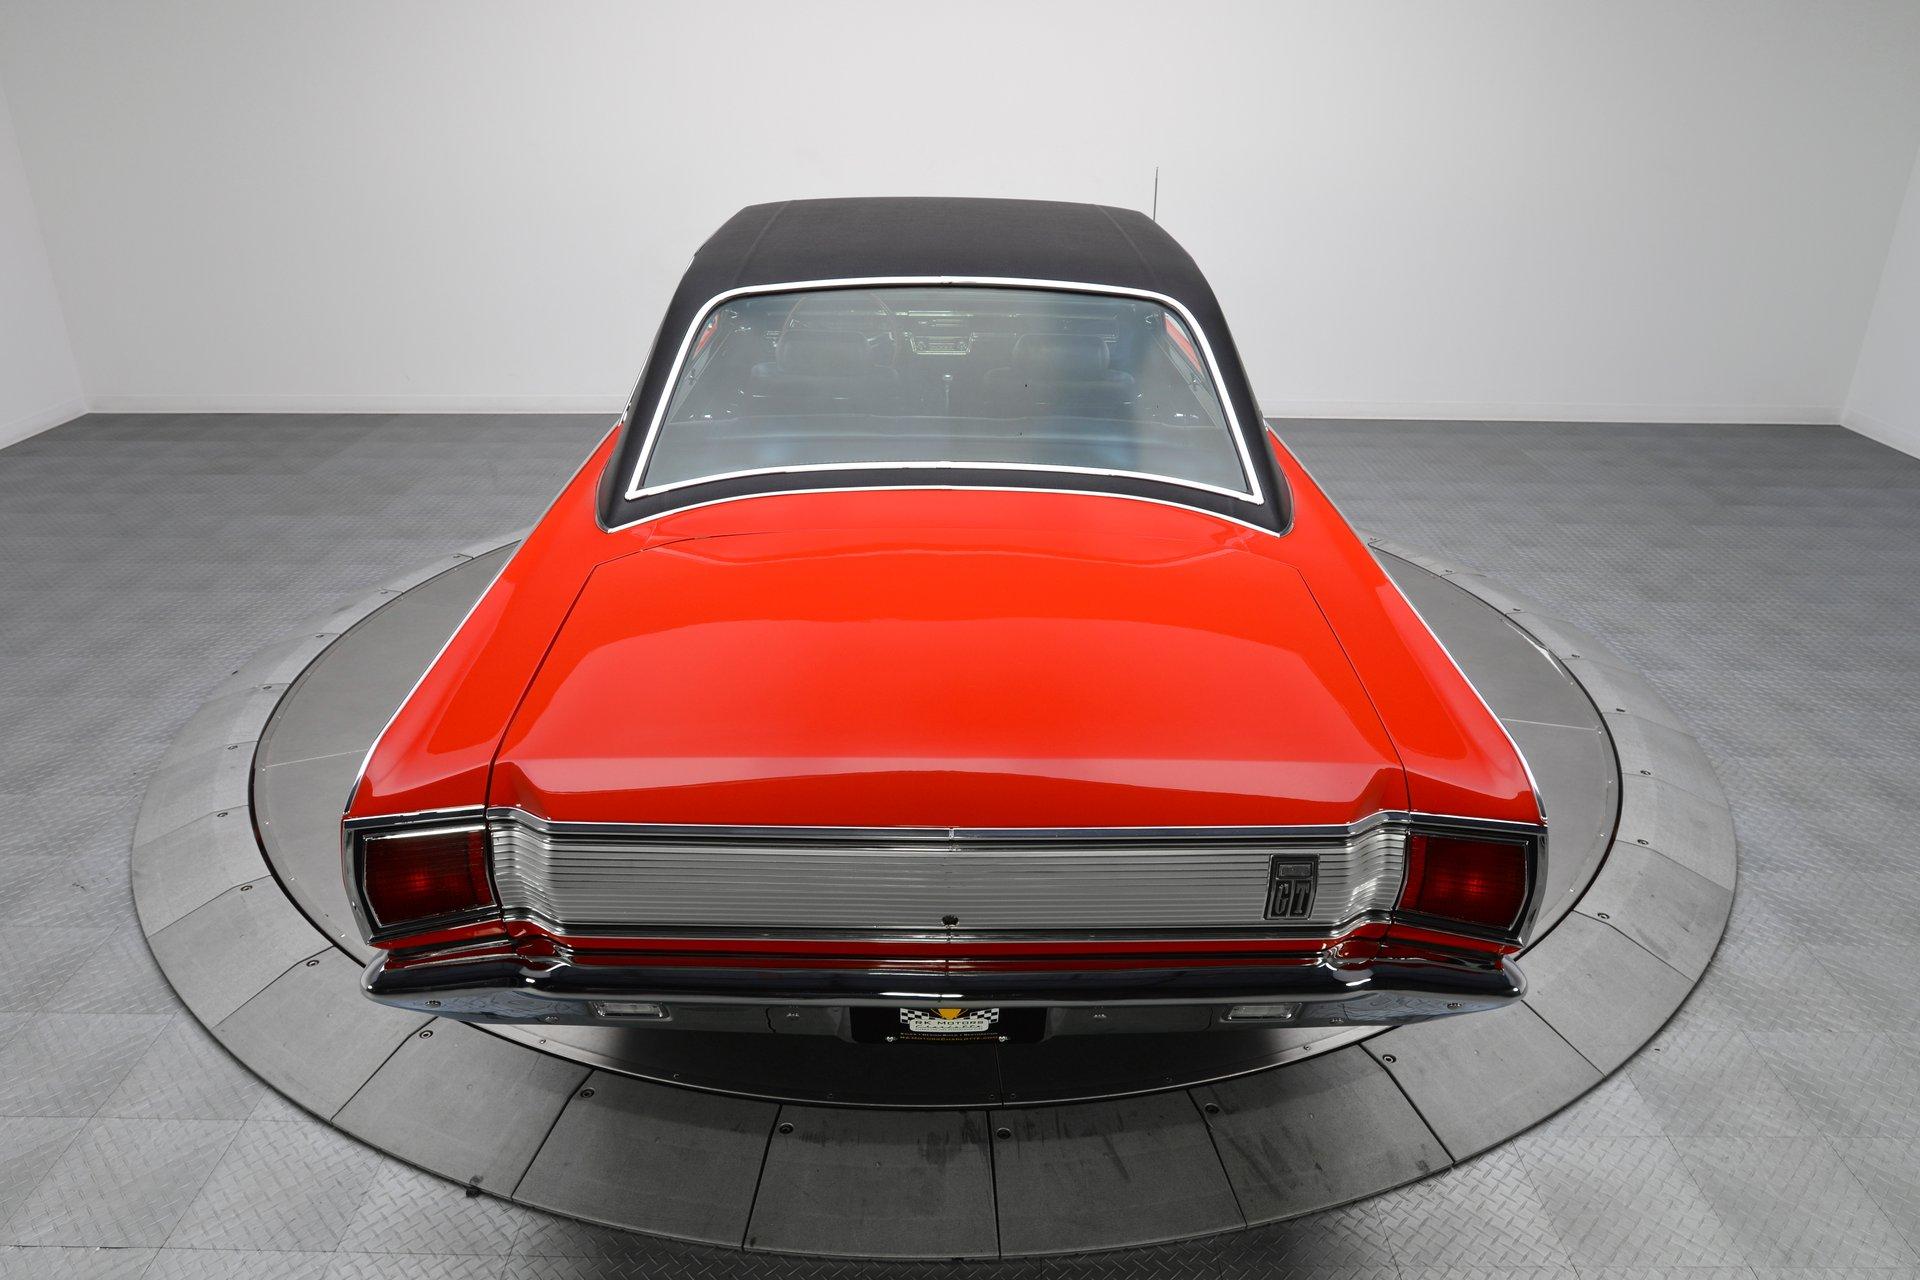 134482 1967 Dodge Dart Rk Motors Classic Cars For Sale 2013 Wiring Diagram Window